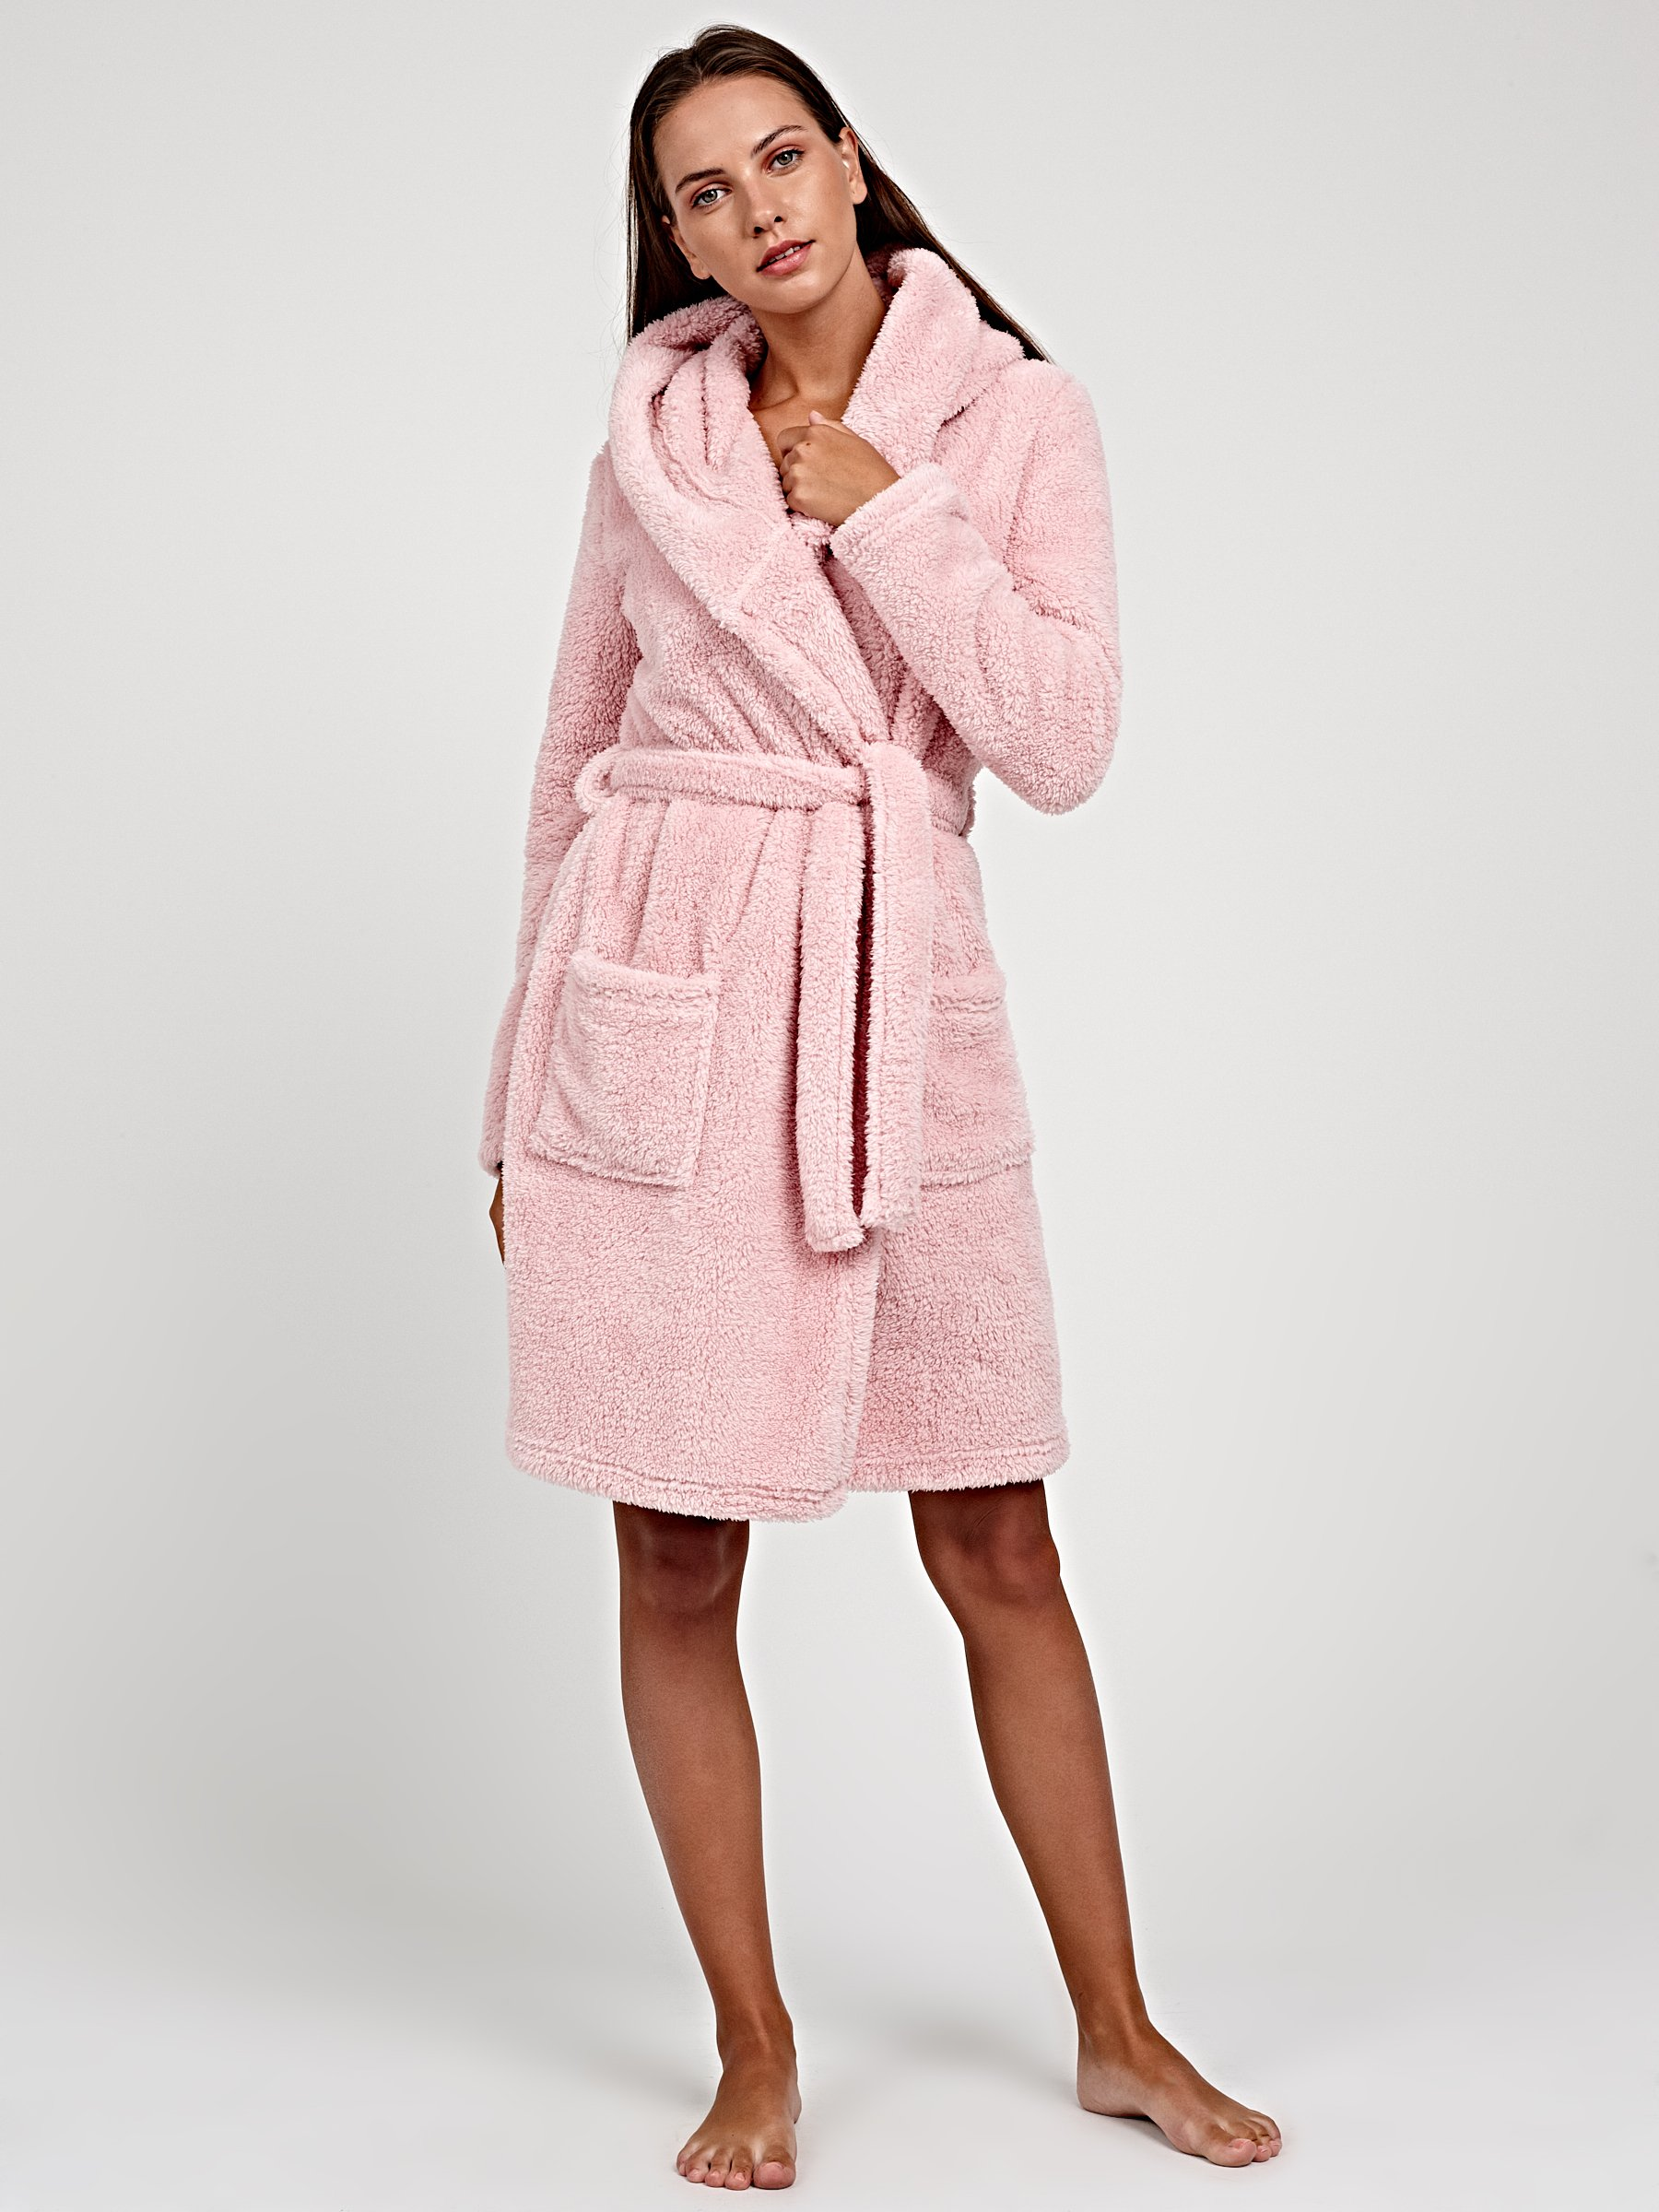 Ladies Fleece Dressing Gown Four Sizes